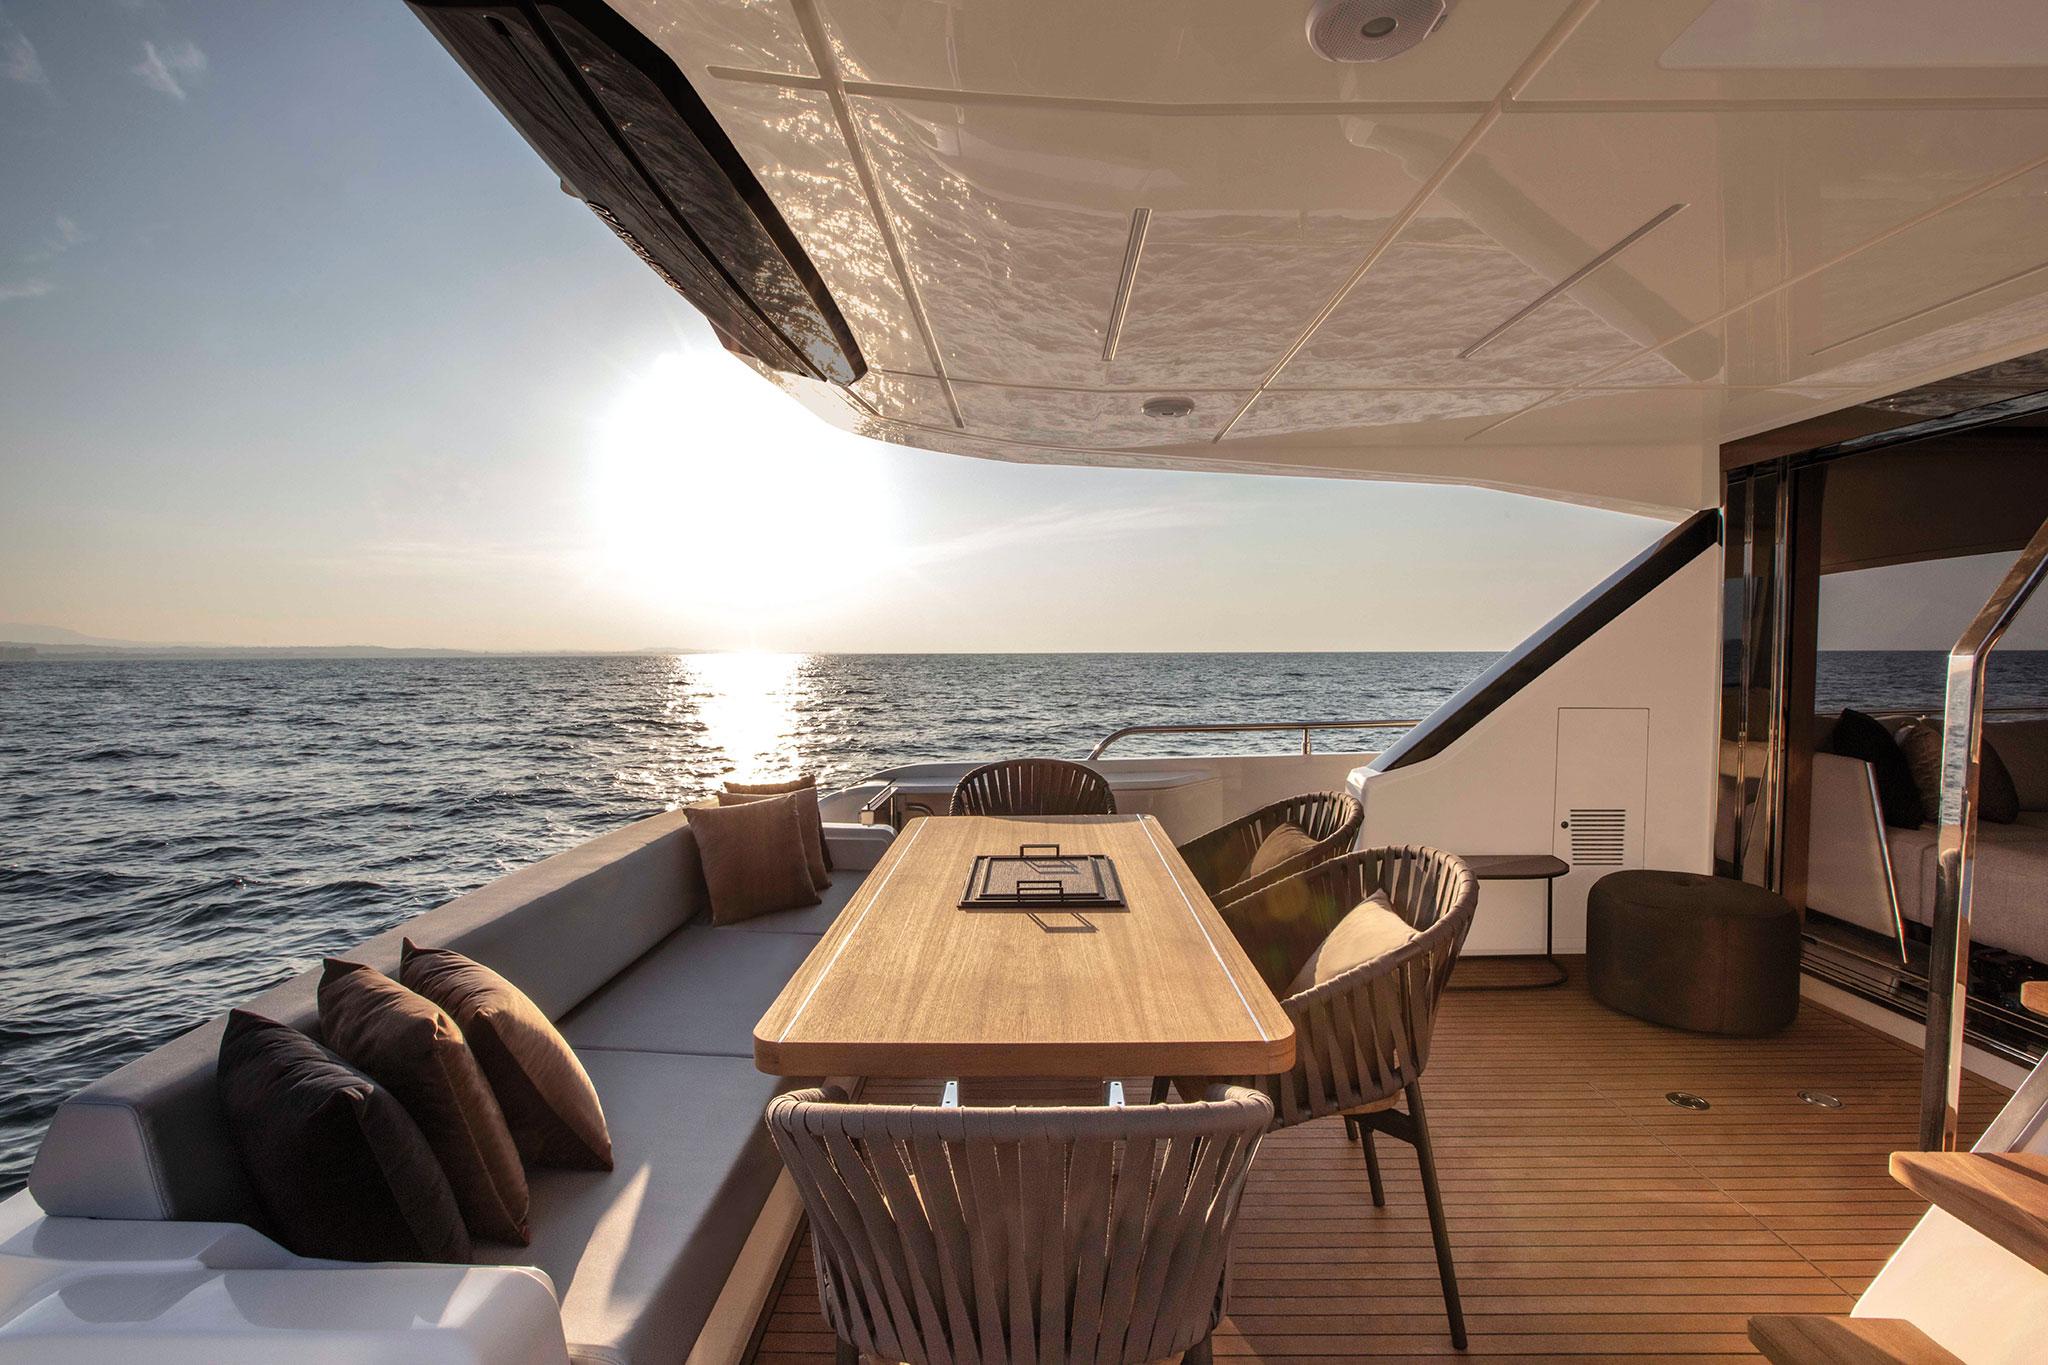 ferretti-Yachts-720- cockpit-yachts-france-173